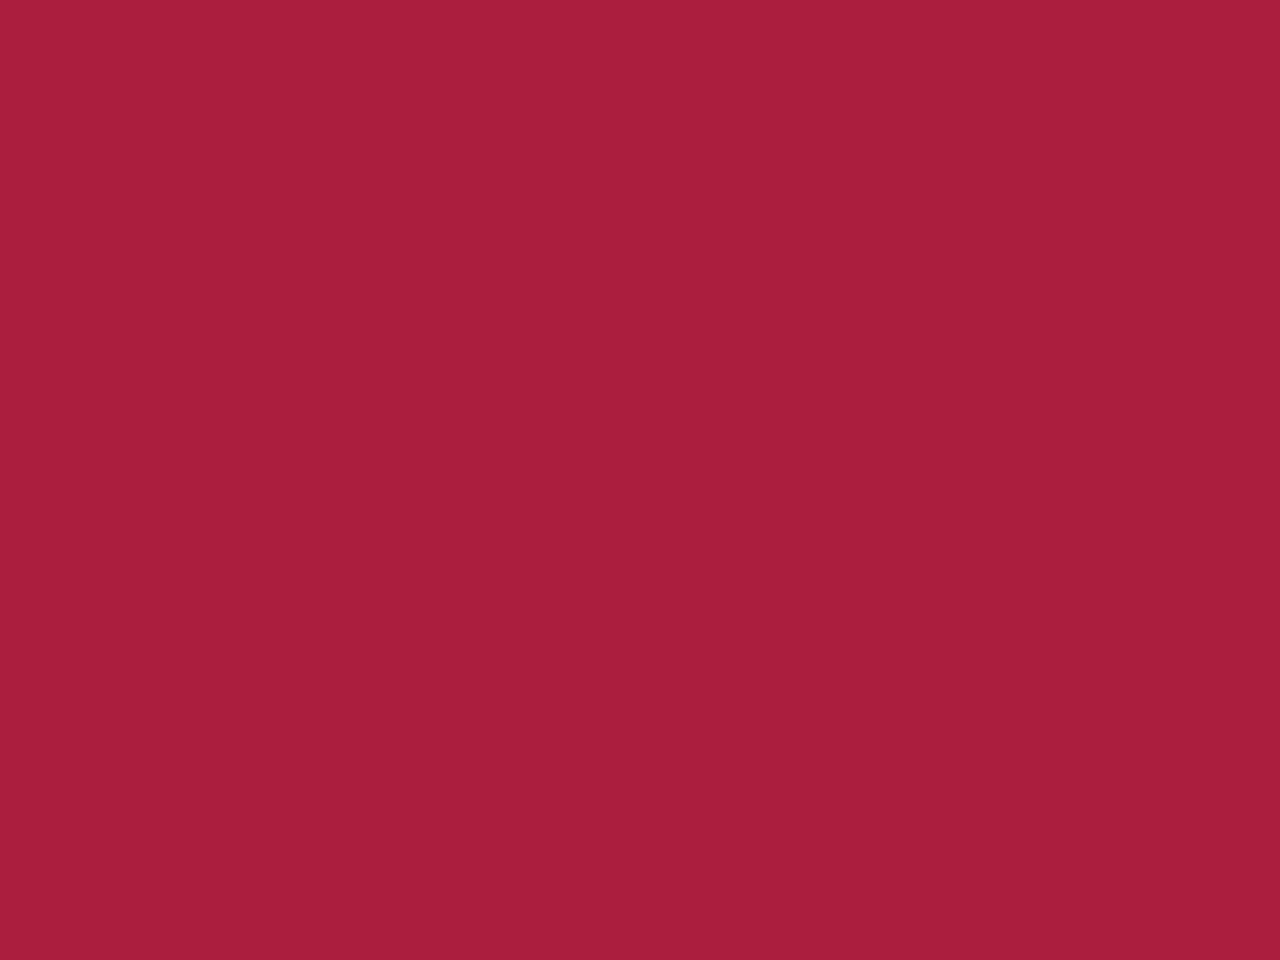 1280x960 Deep Carmine Solid Color Background